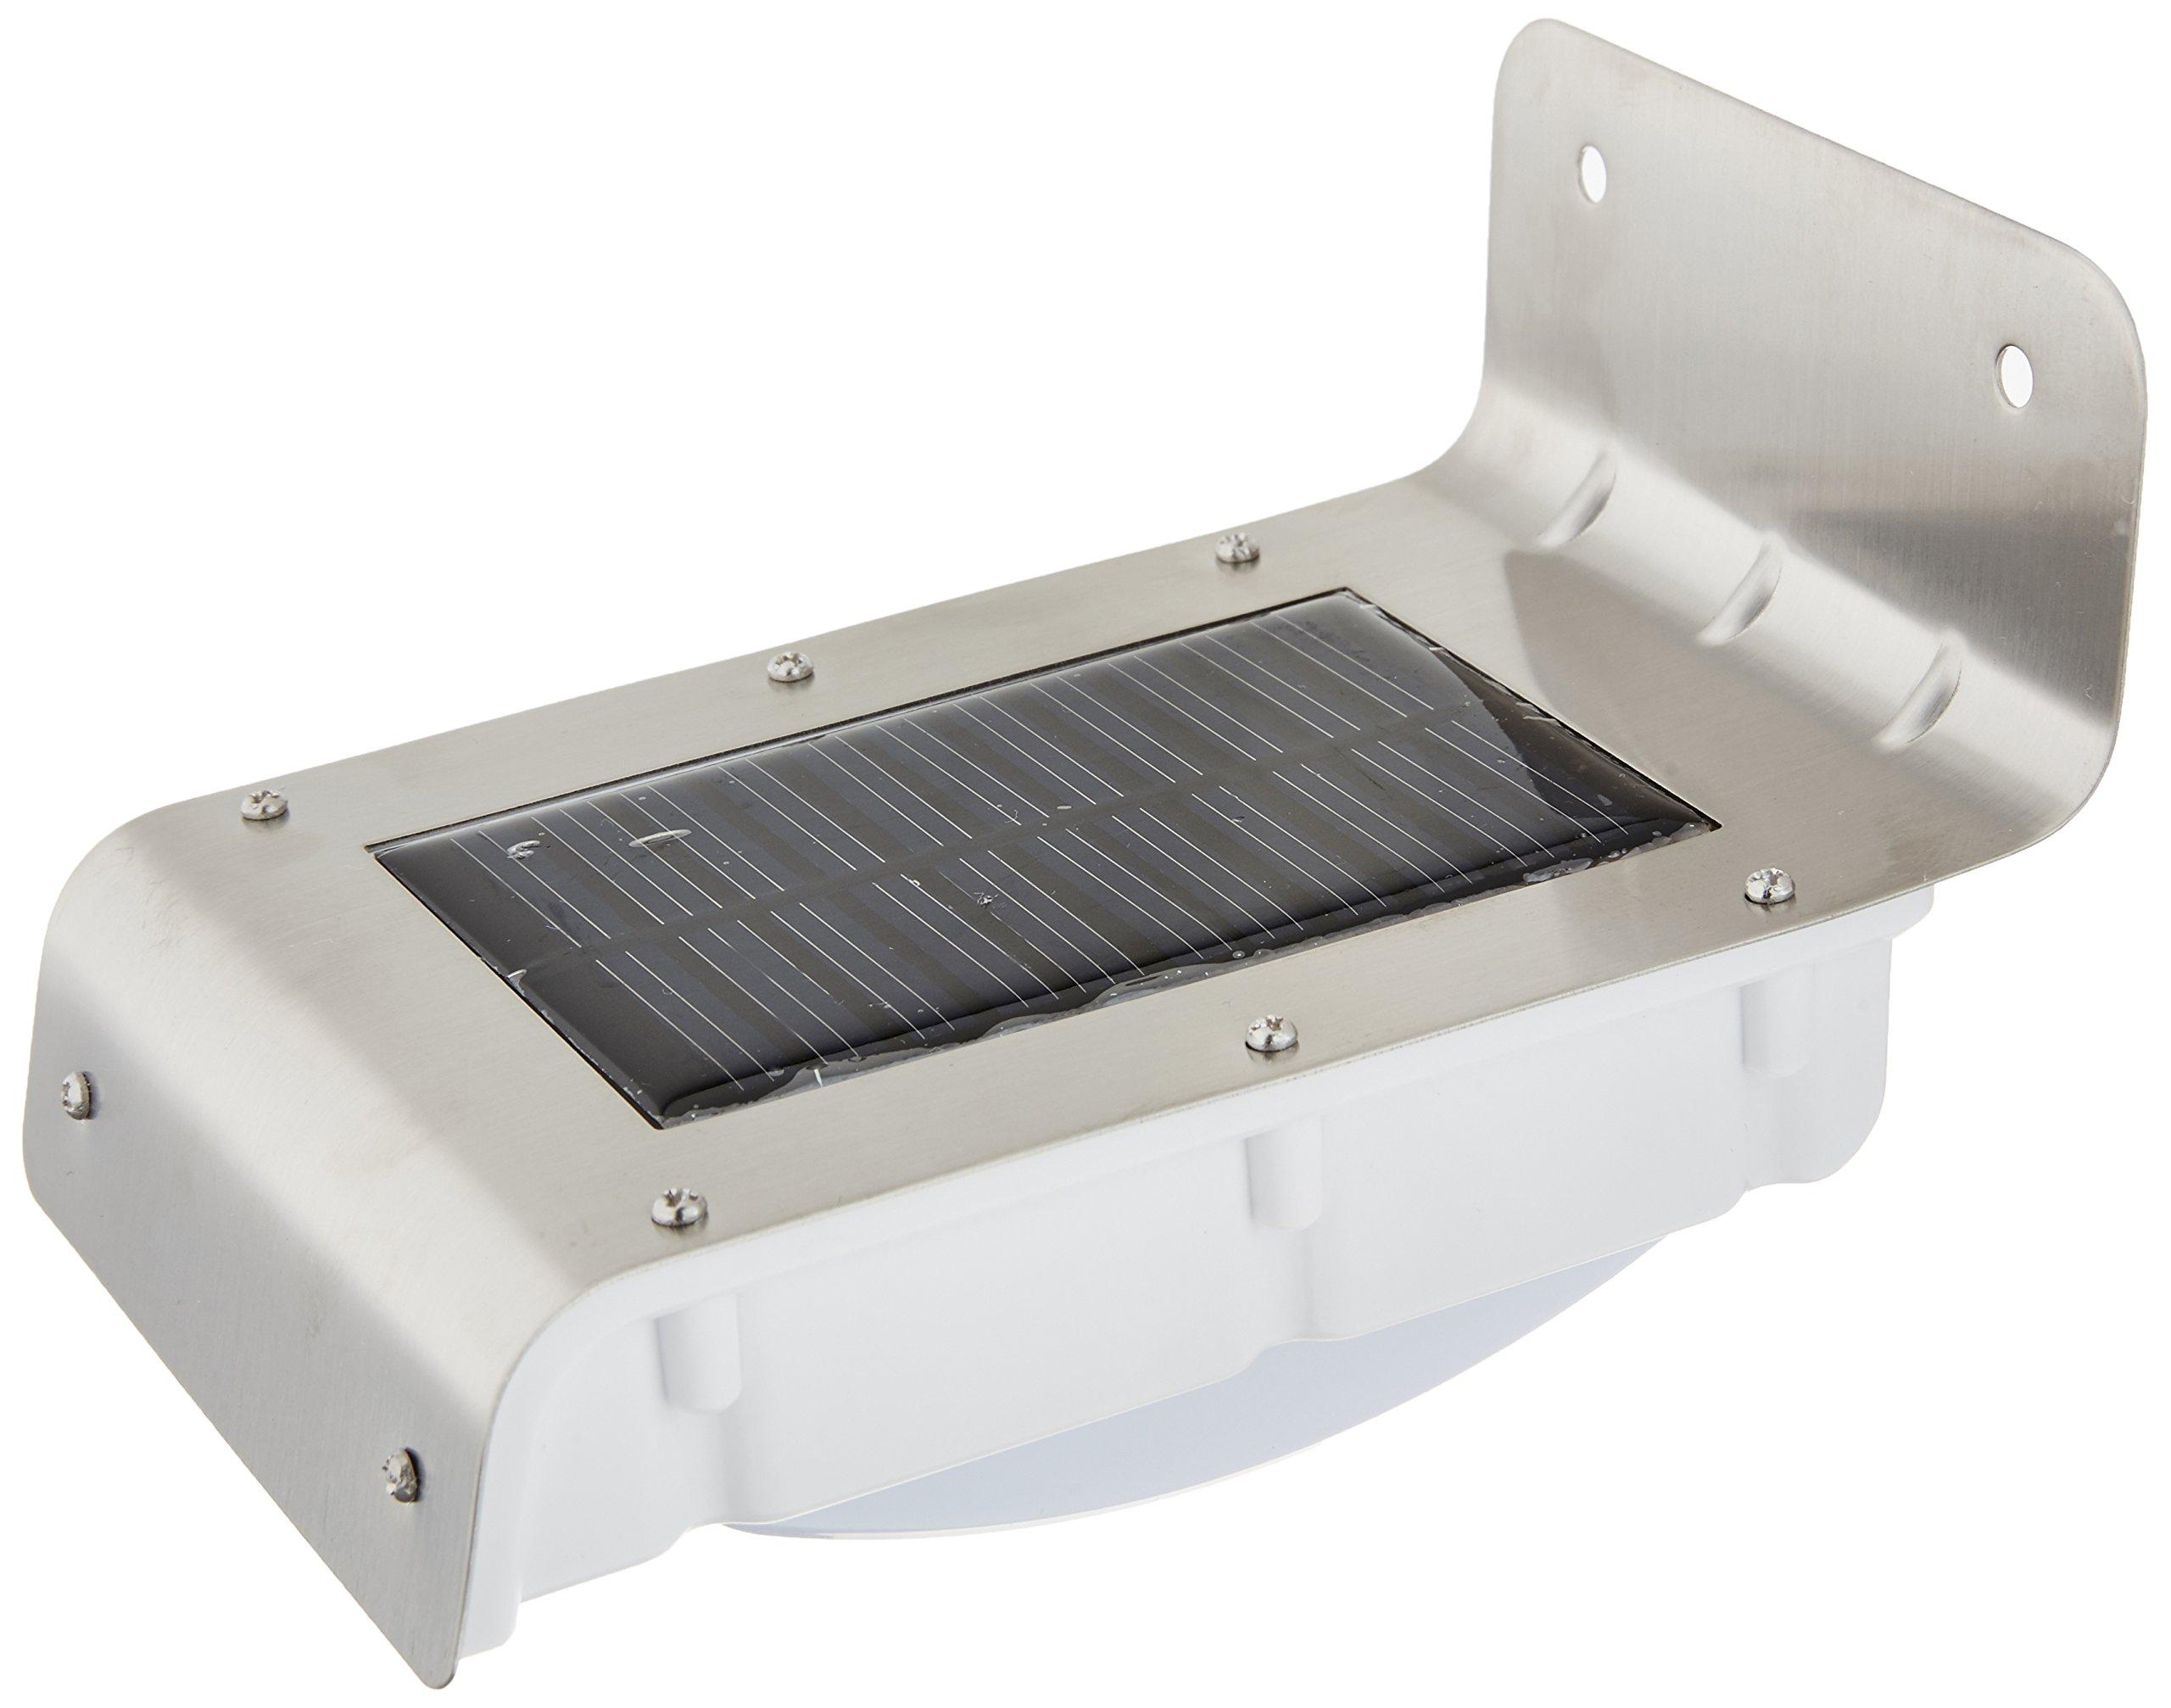 GSL SS E55 Stainless Steel Sensor Wall Mount Solar Light